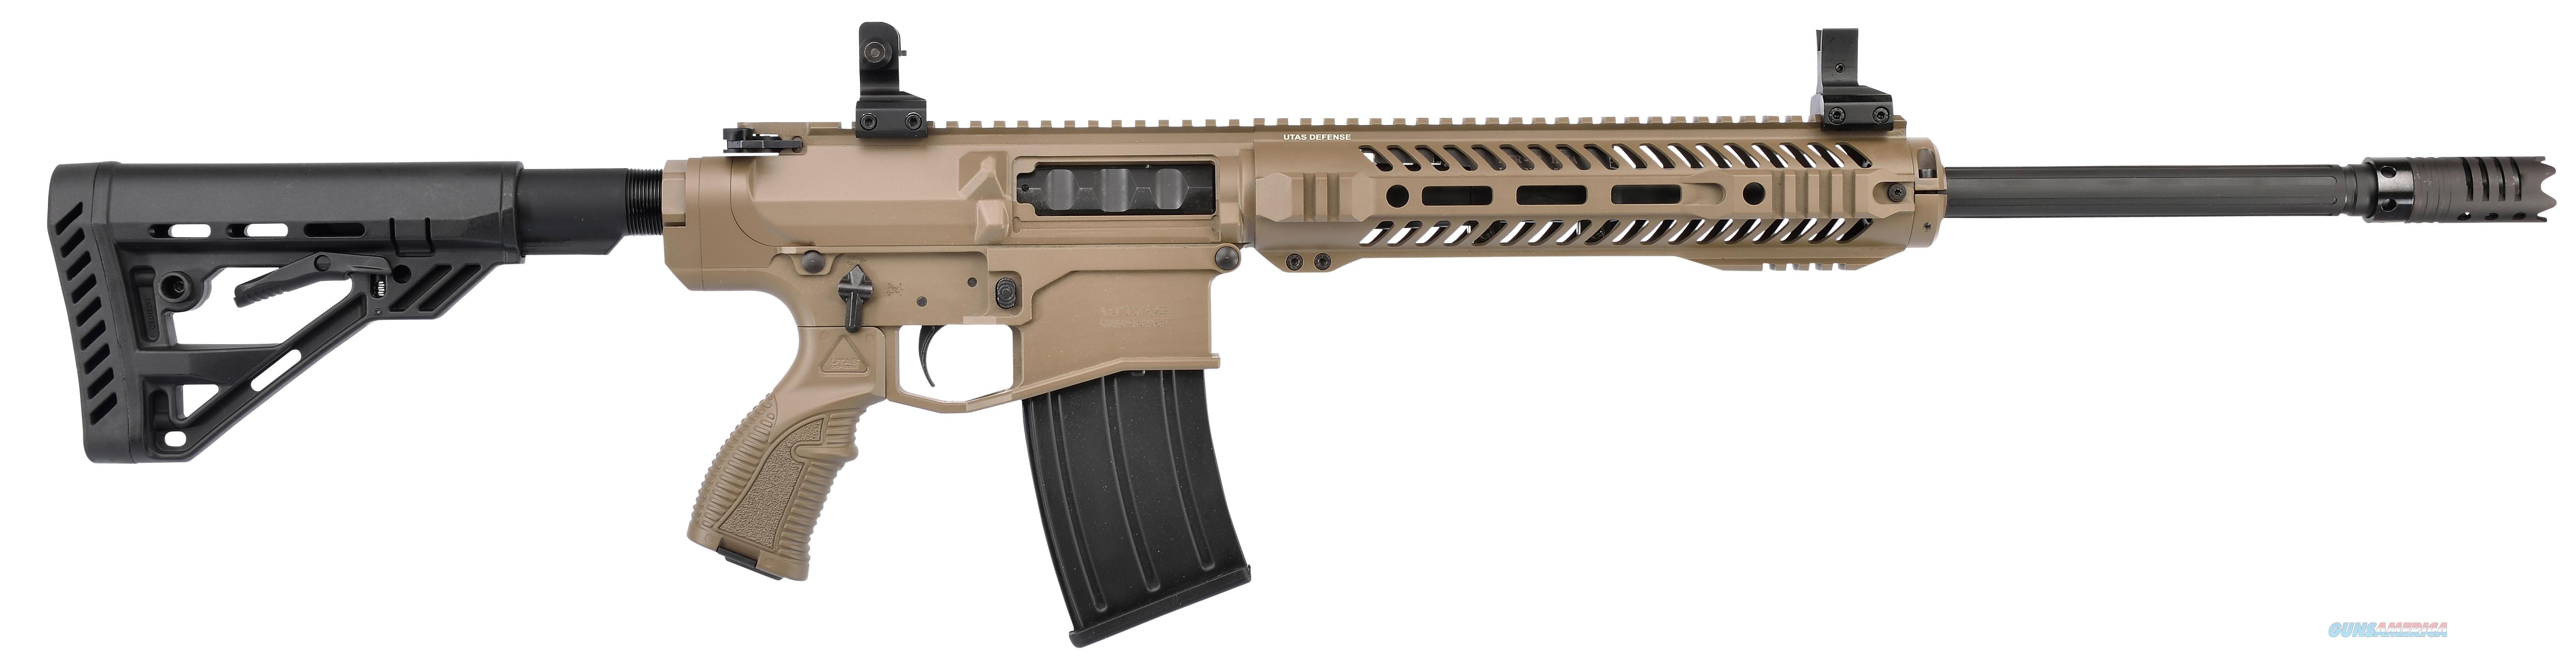 "Utas-Usa Xtr12fd1 Xtr-12 Semi-Automatic 12 Gauge 20.8"" 3"" 5+1 Synthetic Adjustable Fde Flat Dark Earth Cerakote/Black Cerakote XTR12FD1  Guns > Shotguns > TU Misc Shotguns"